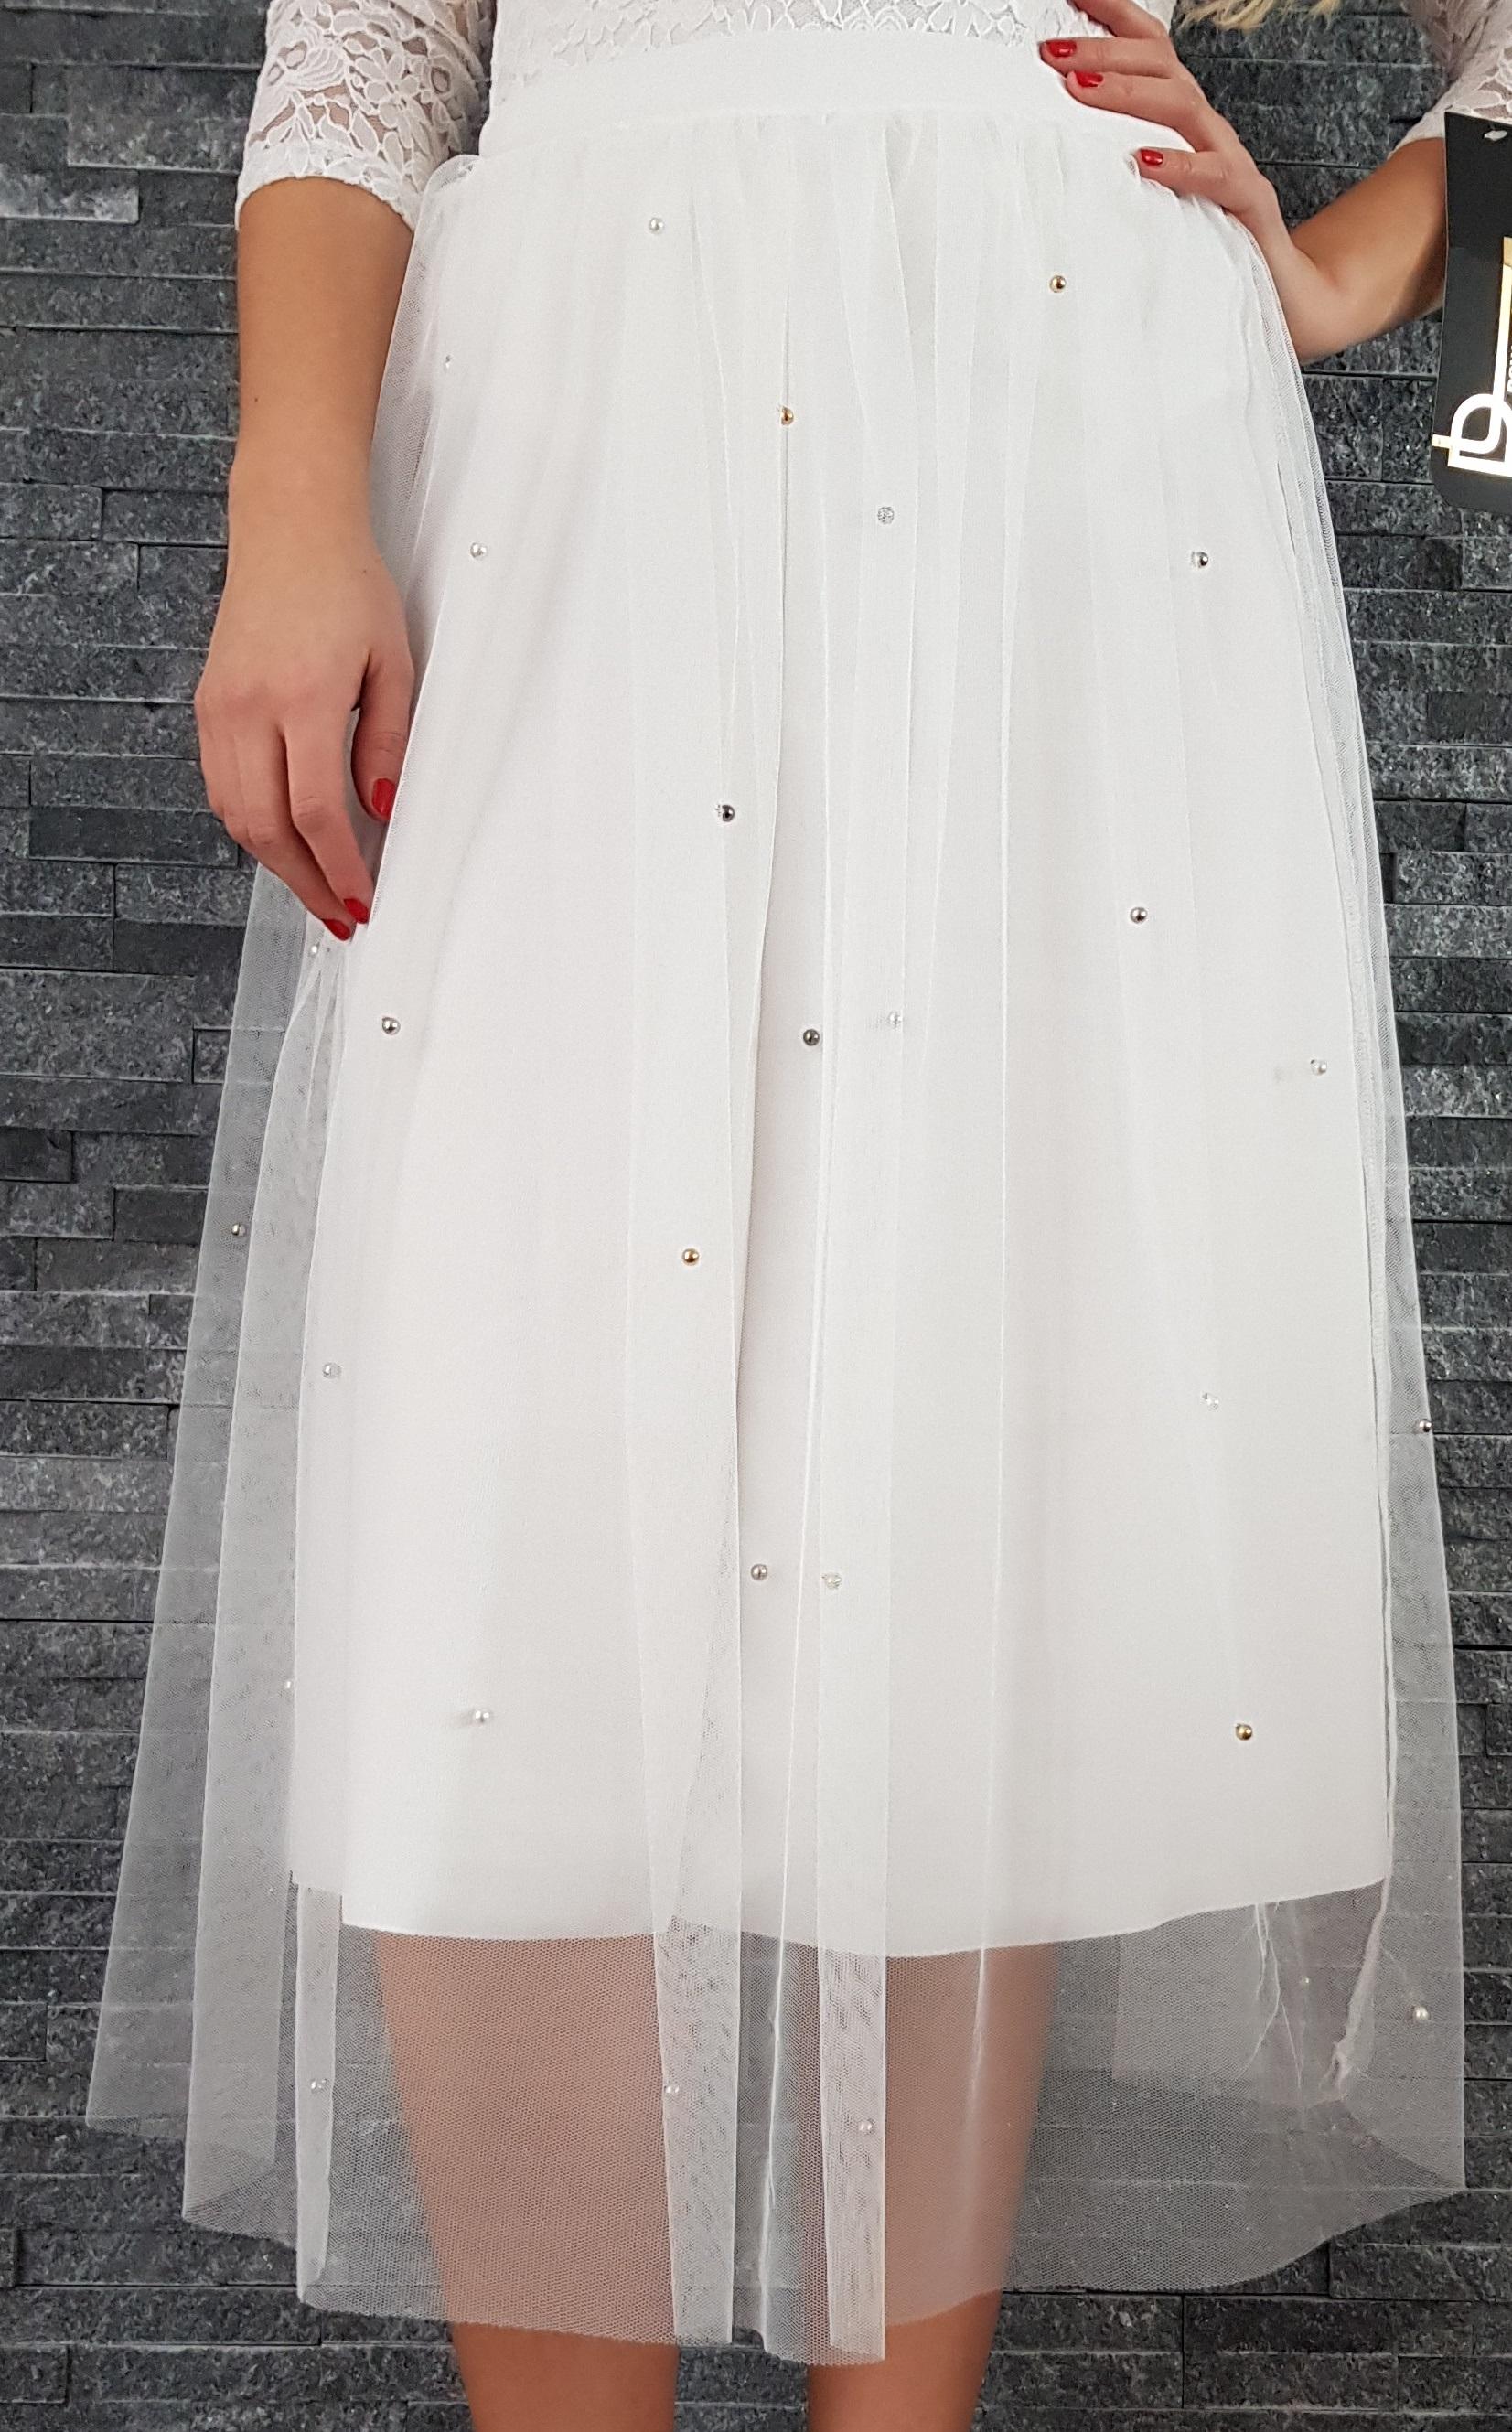 Biela tylová MIDI sukňa s perličkami 92afe83151